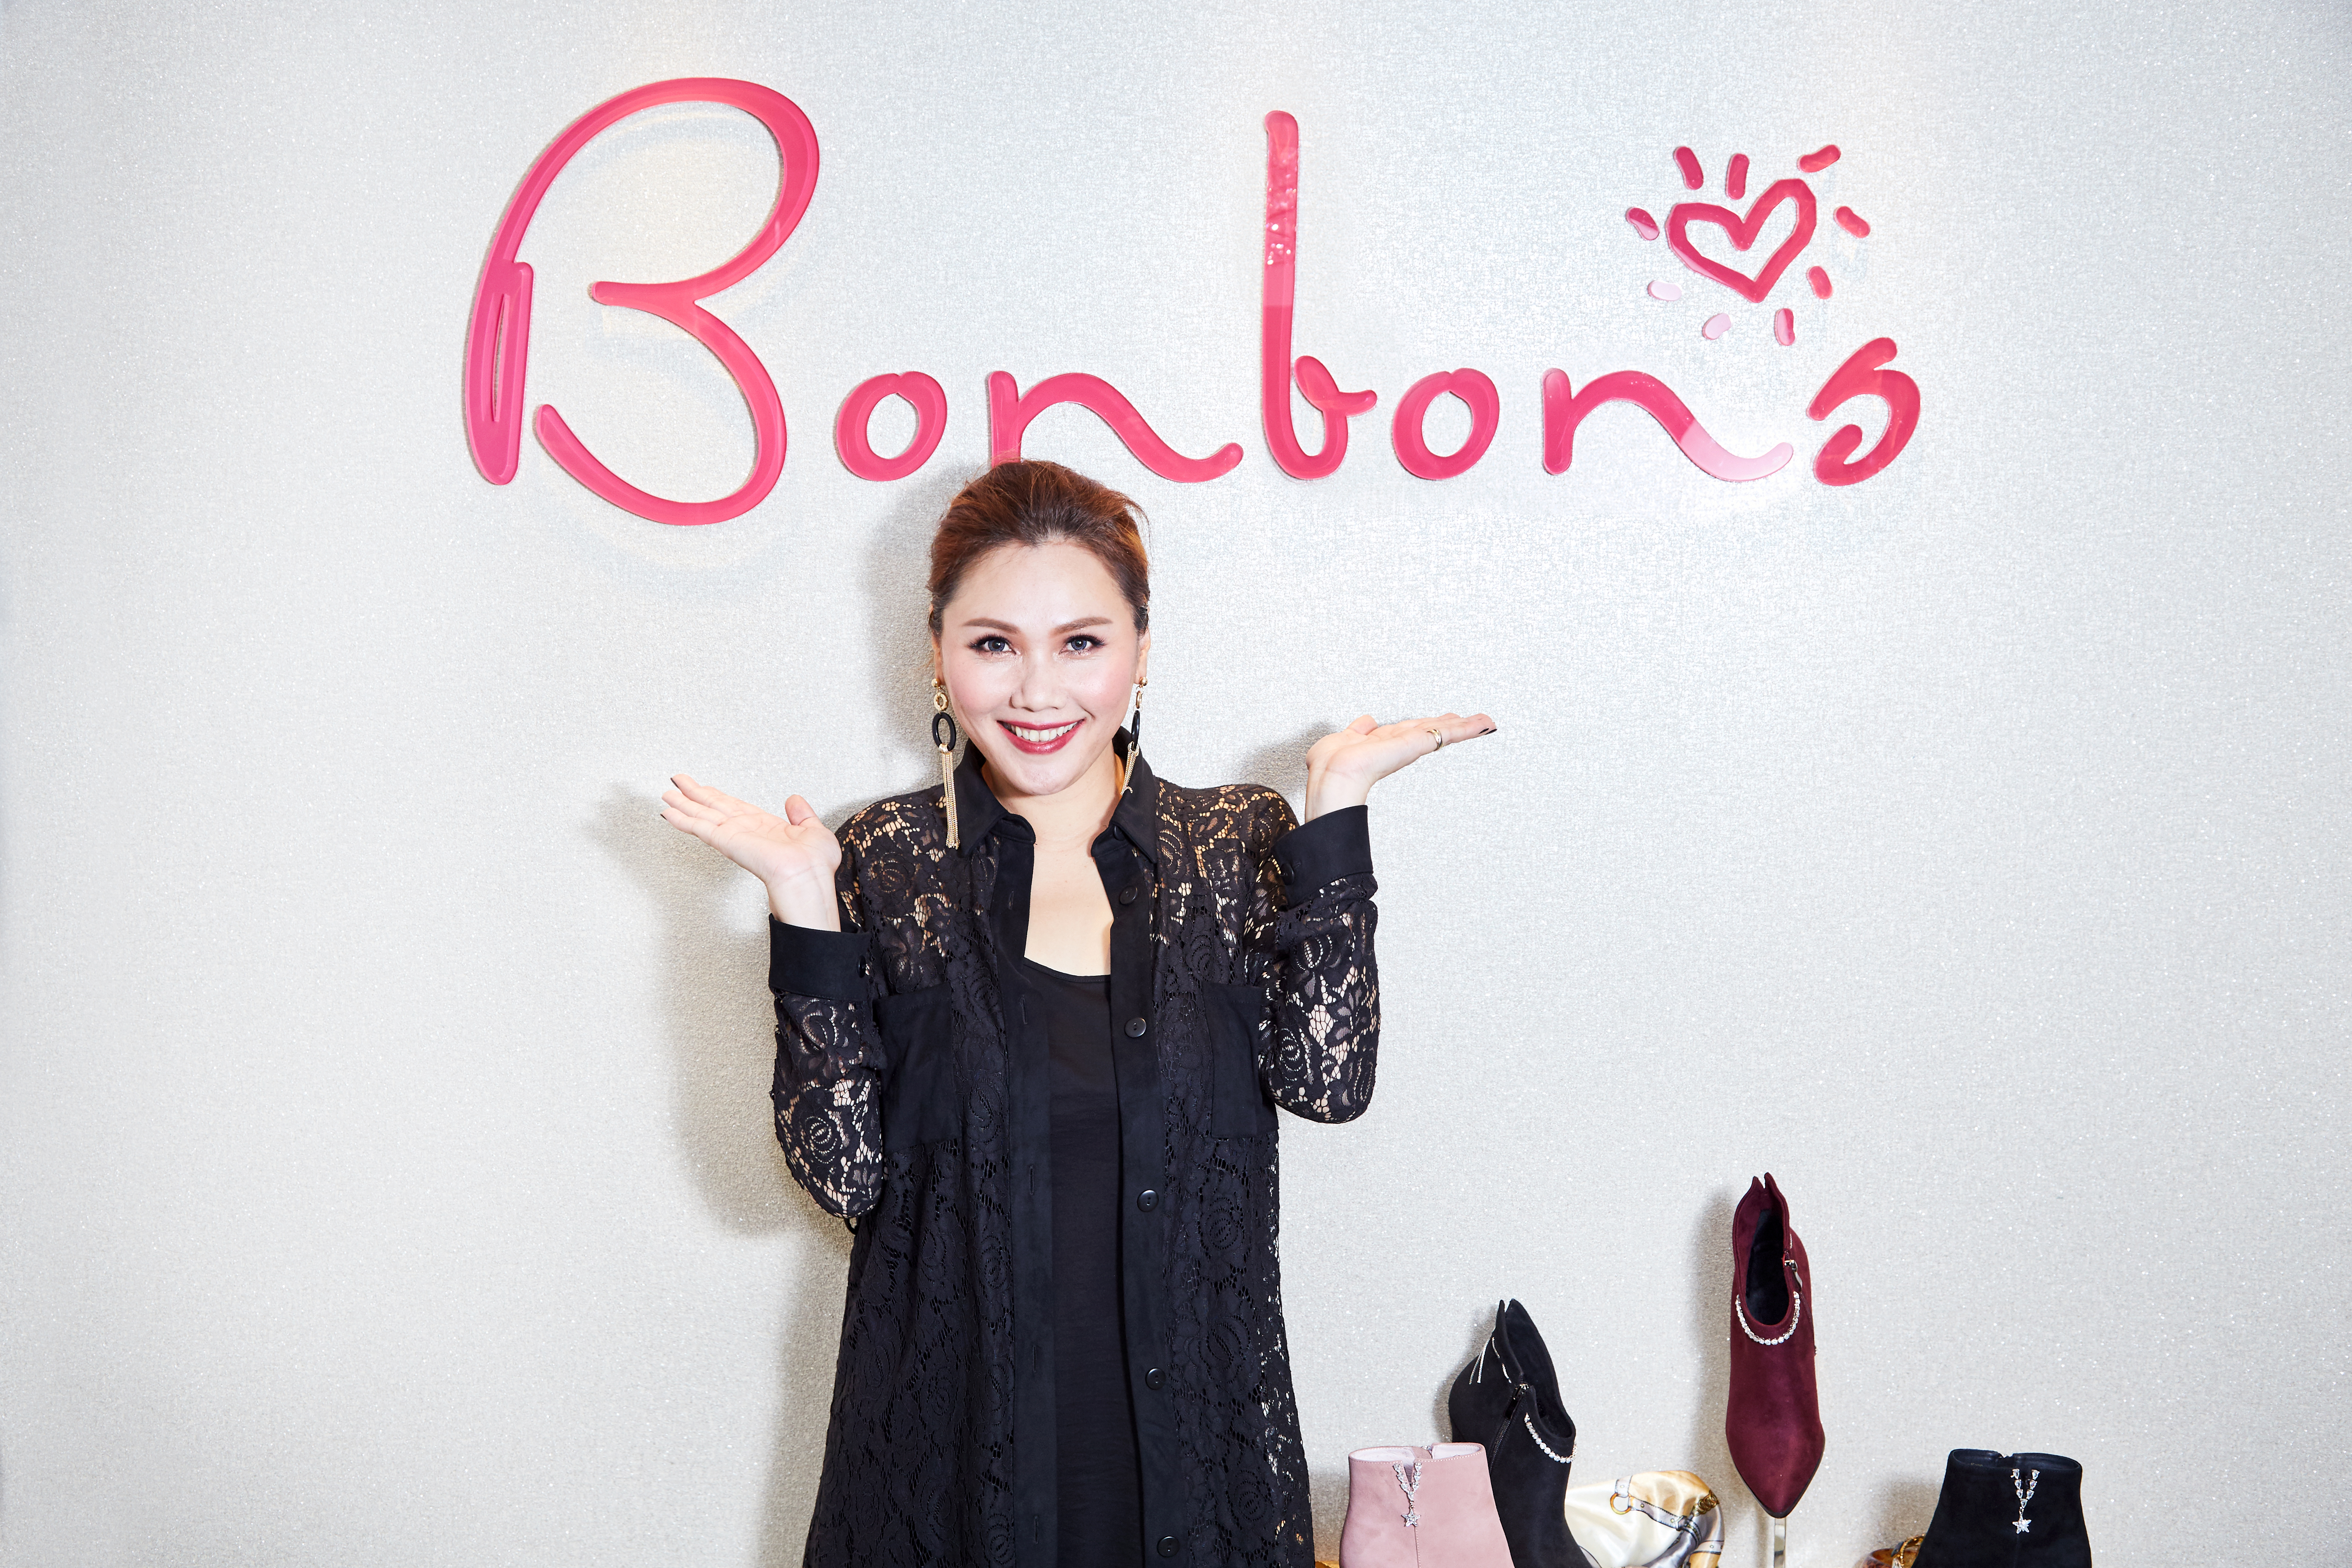 Bonbons 多元的品項,是 Lisa 心中重要的核心價值,不會因為潮流而捨棄任何一個系列。